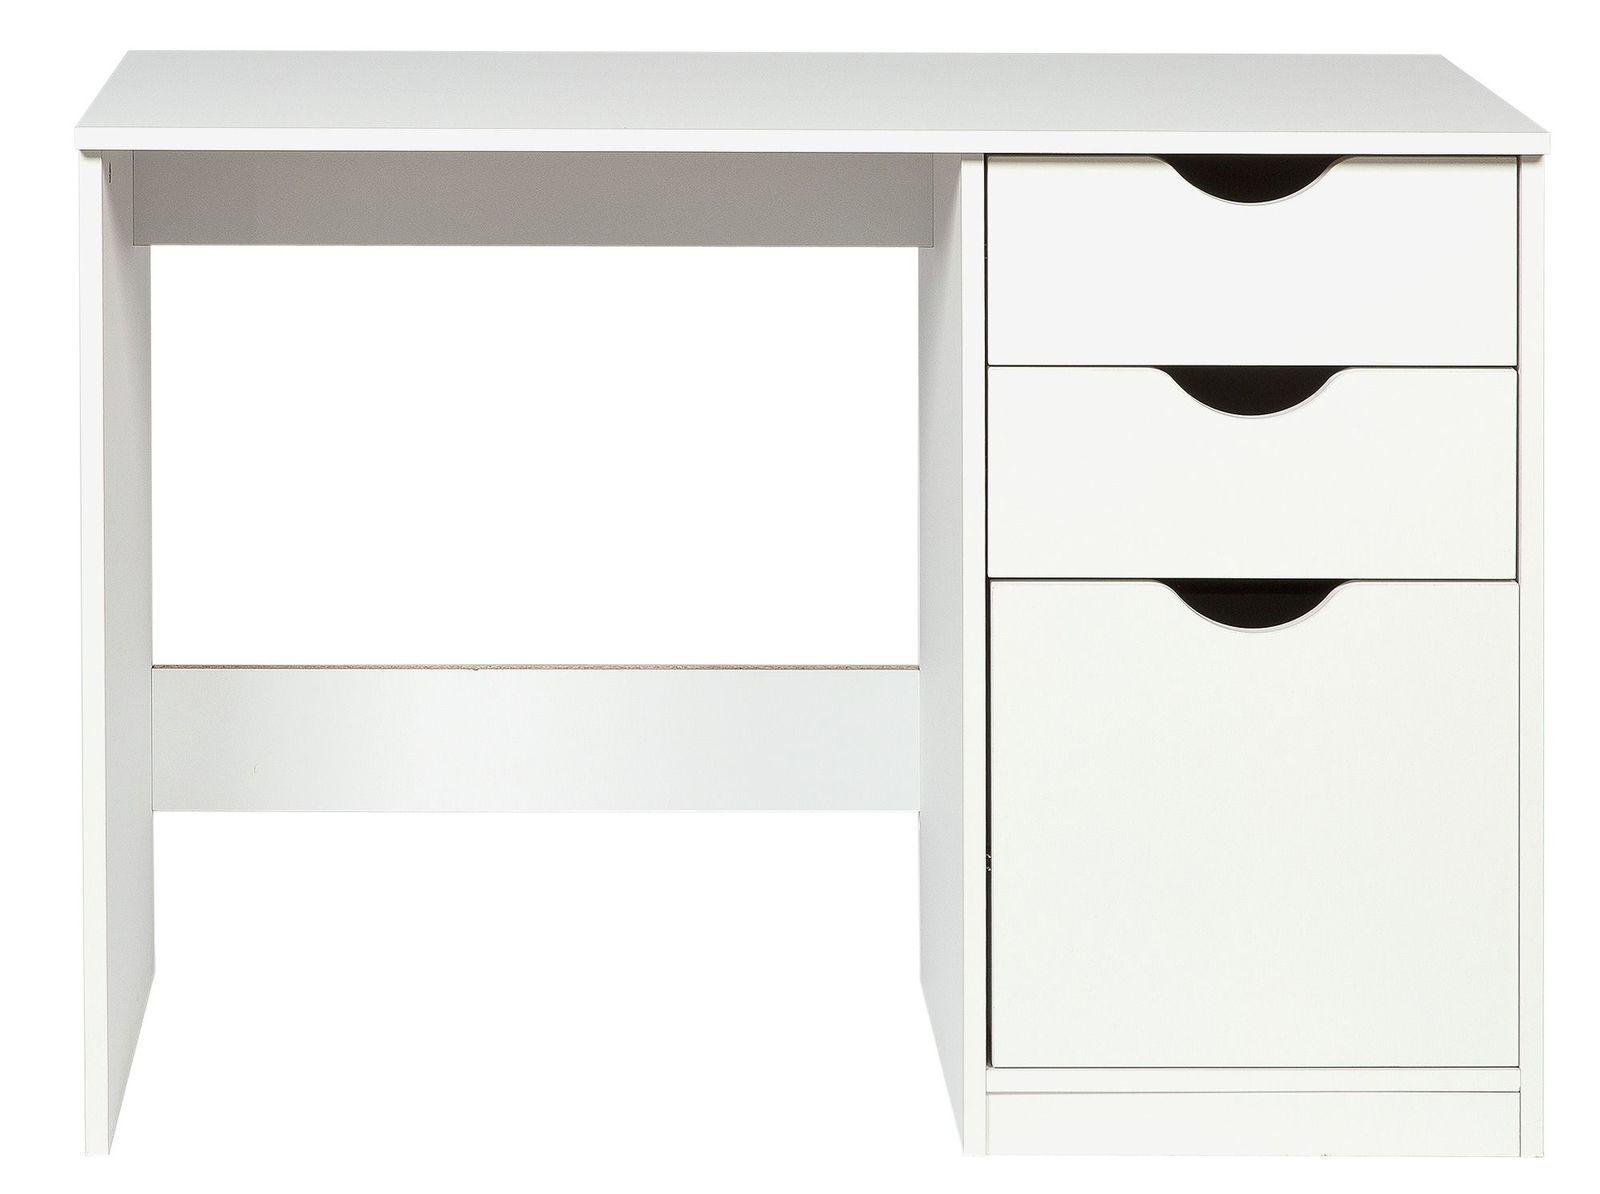 White Childrens Desk Study Table 3 Drawers Storage Shelves